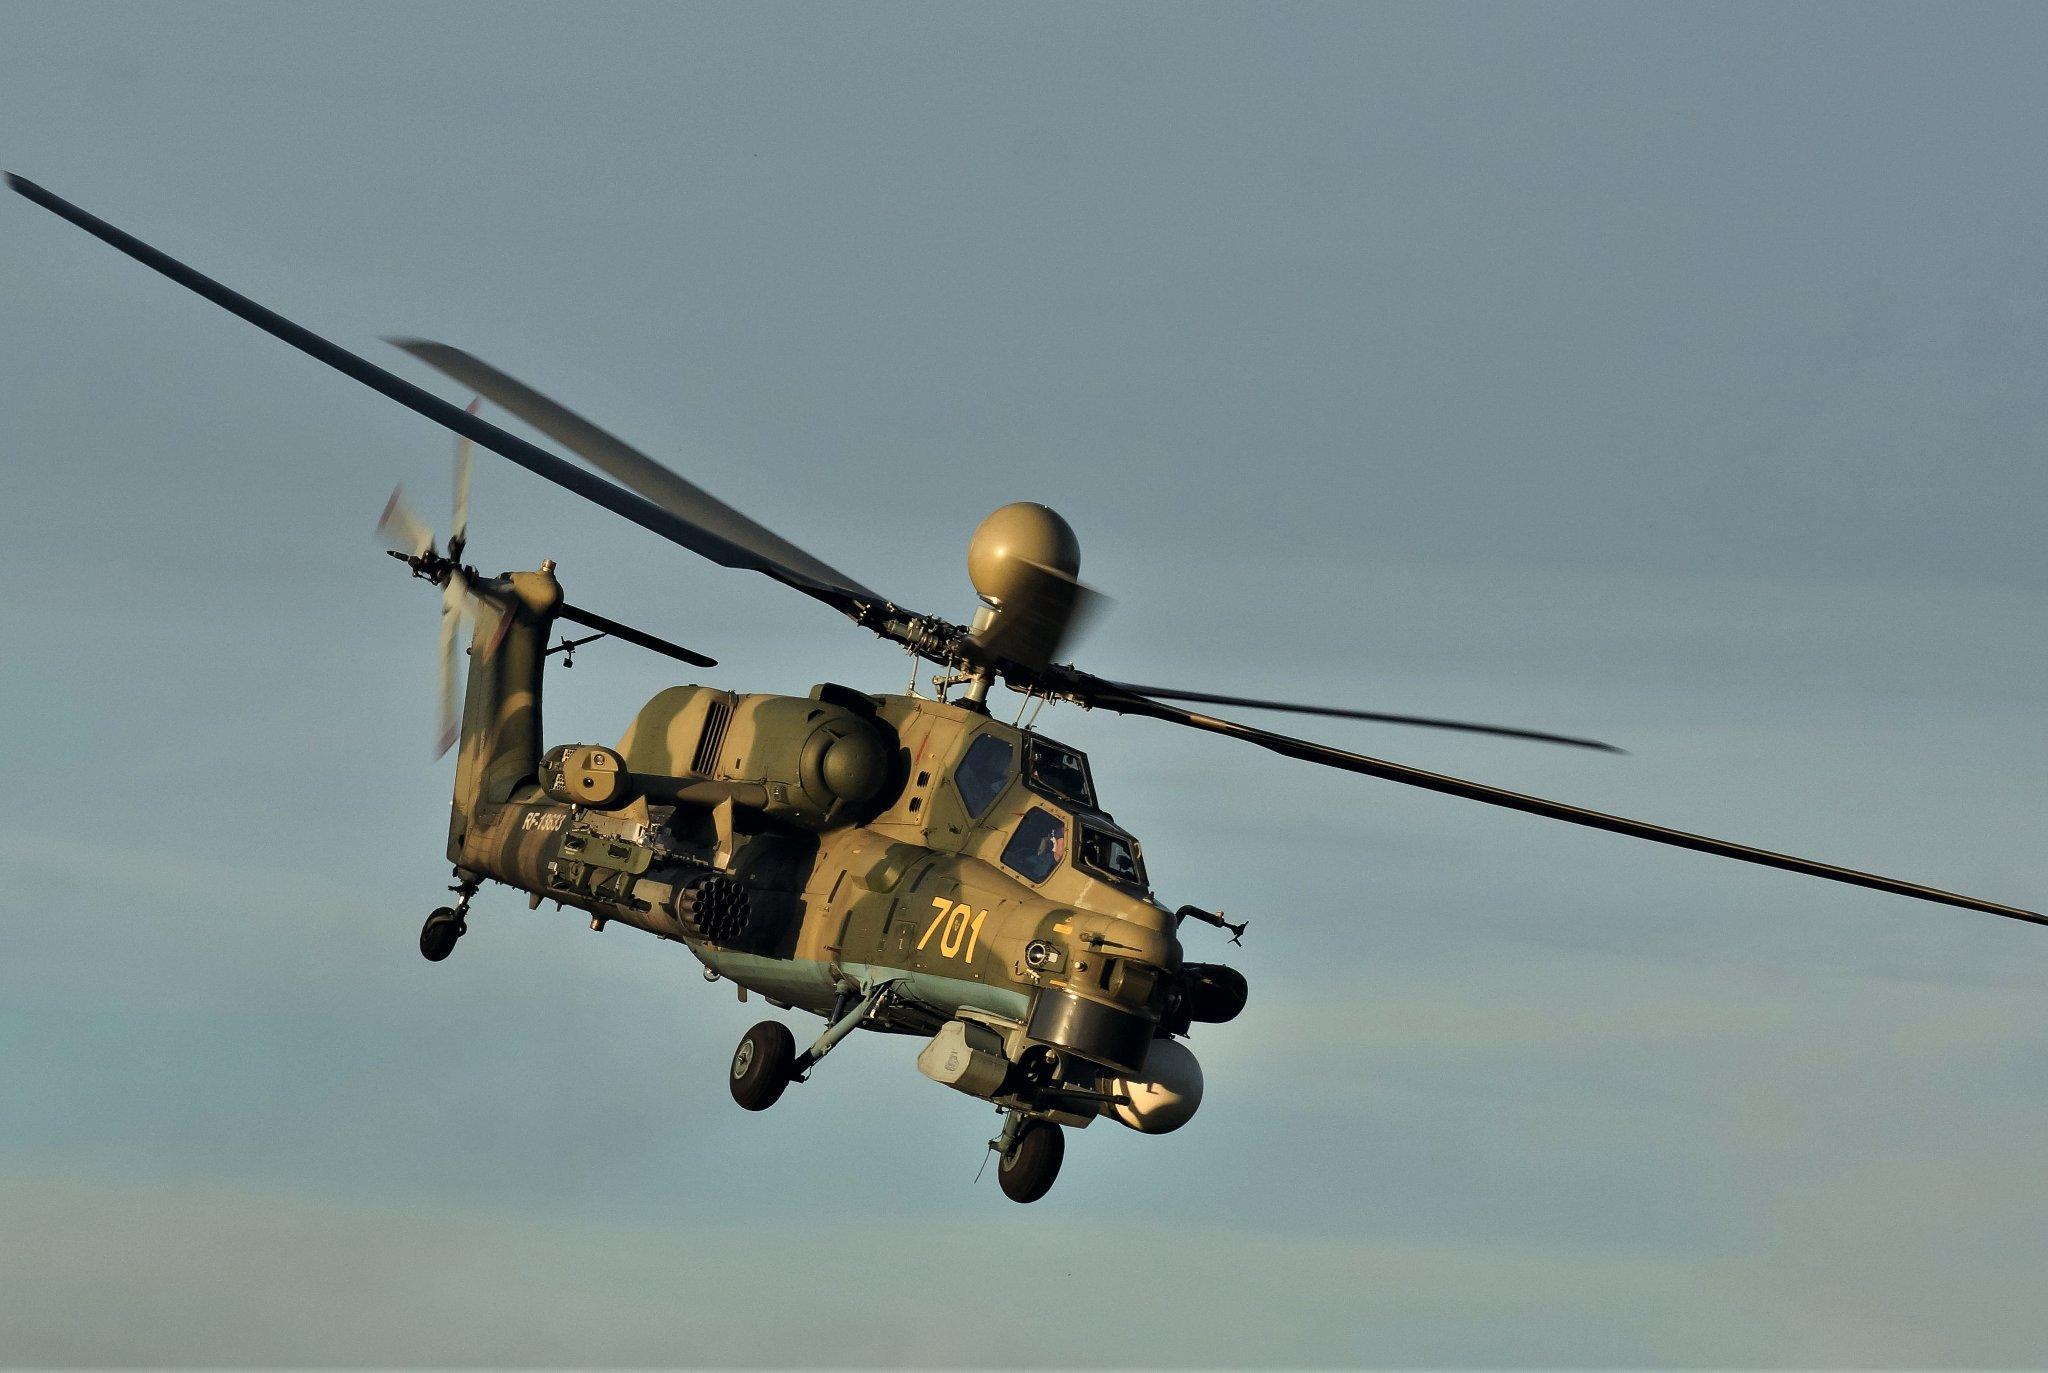 Mil Mi-28NM Havoc: The Russian Chopper That Made ISIS Run Screaming